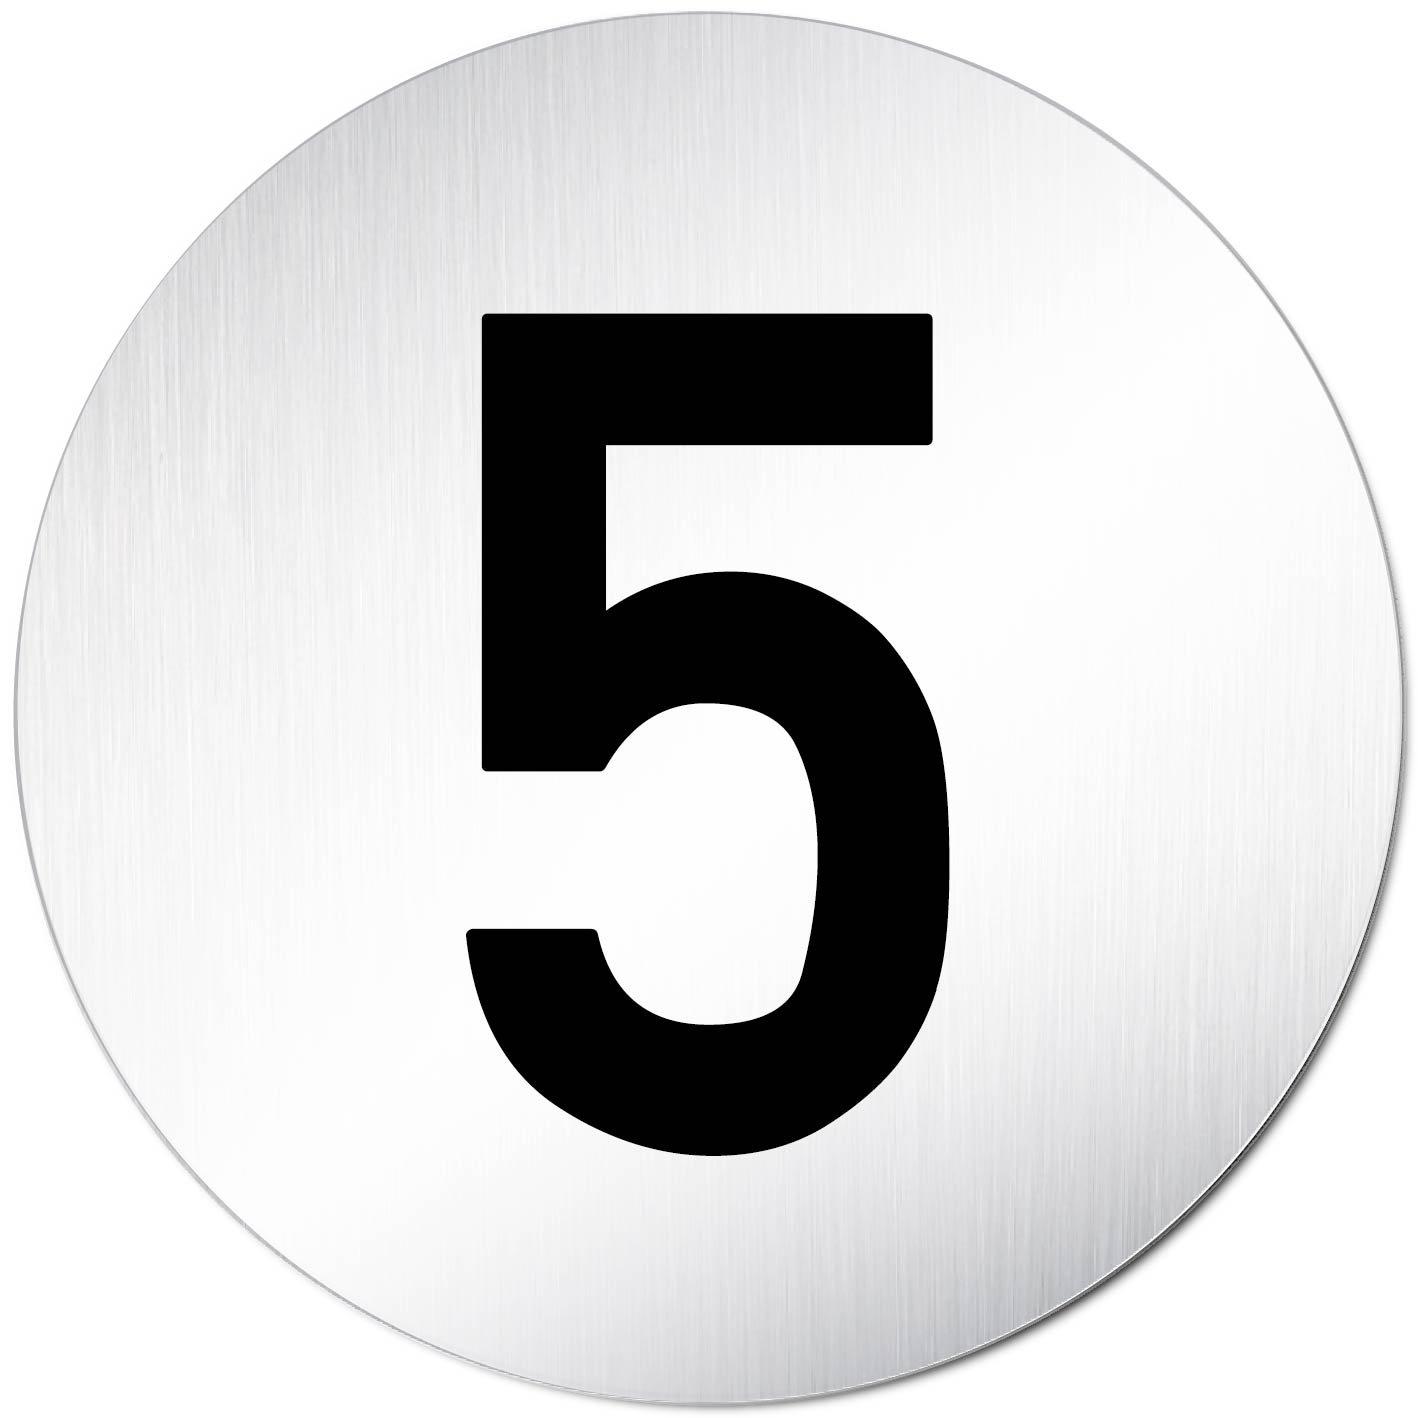 Zahlen Schild XXL T/ürschild /• 5 /• Ziffern T/ürnummer /• /Ø 100mm /• Aluminium /• T/ürschild Hinweisschild /• Schild eloxiert